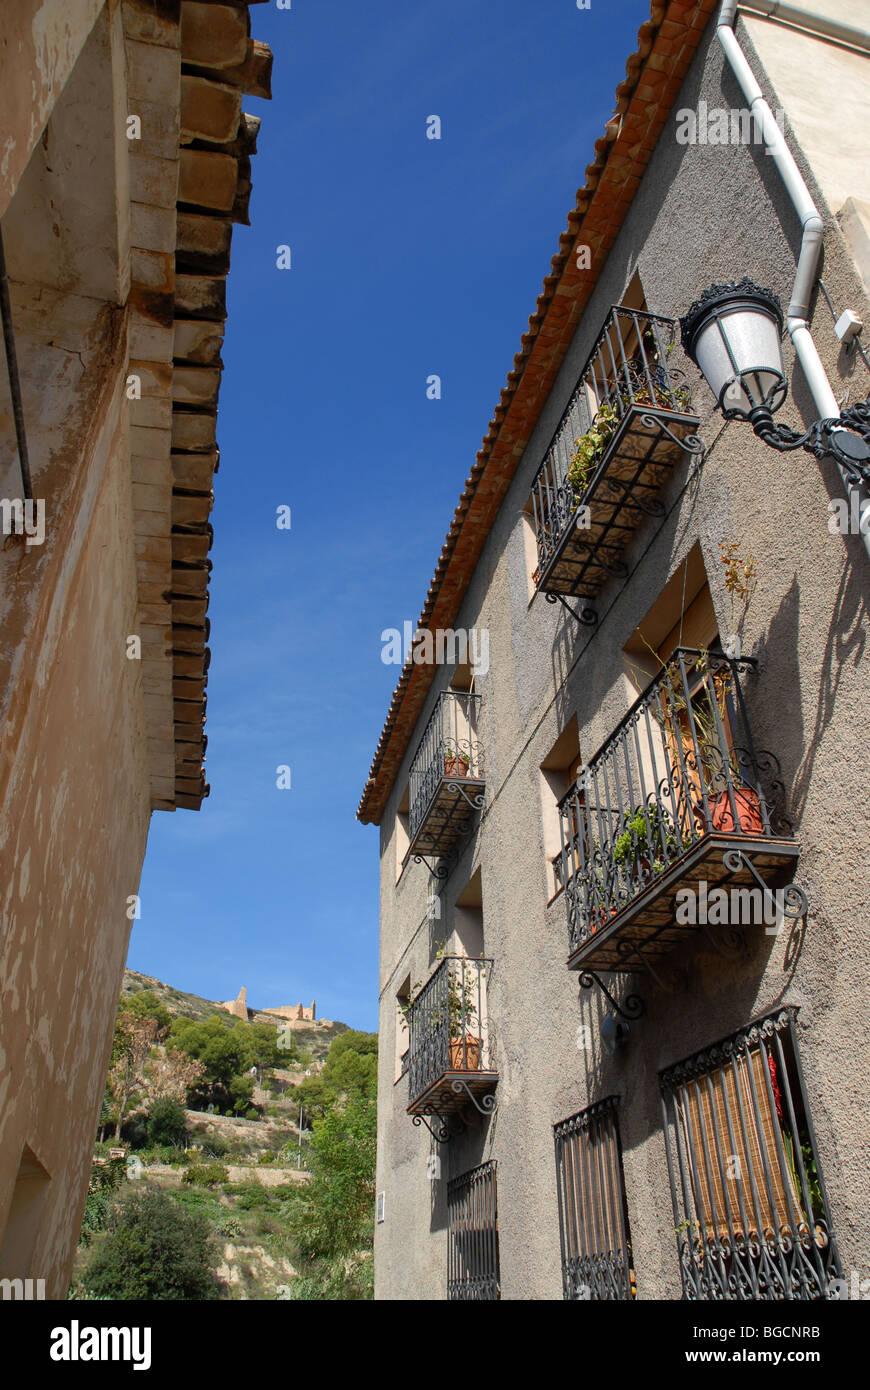 village houses and ruined castle of Relleu, Alicante Province, Comunidad Valenciana, Spain - Stock Image